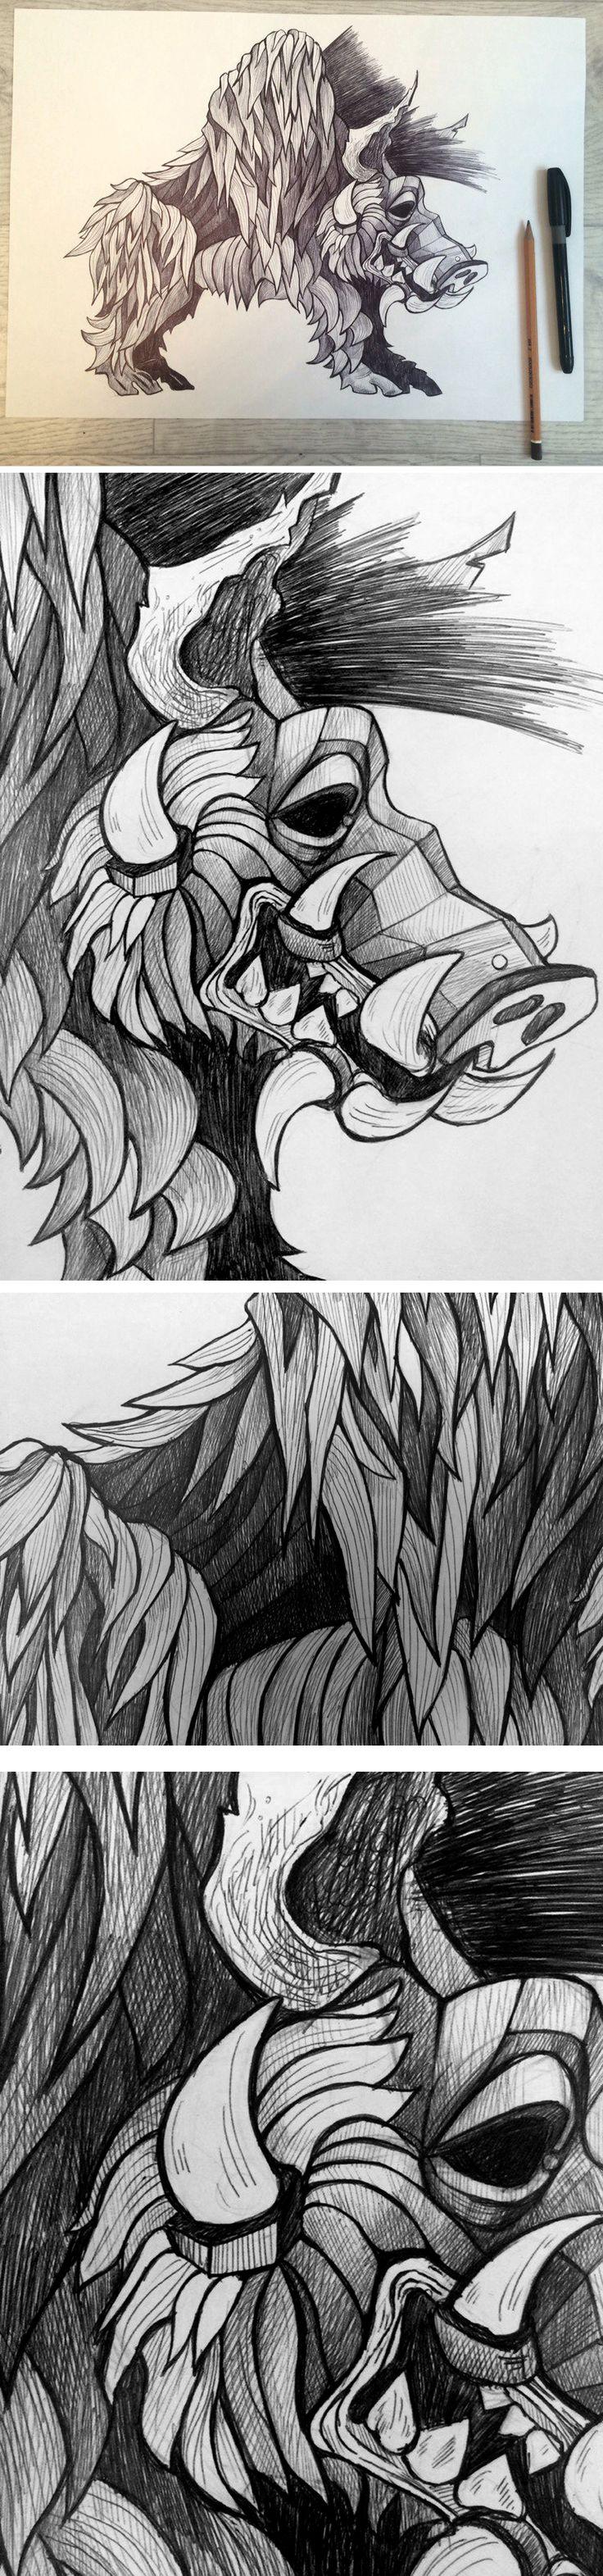 Графика на тему подвигов Геракла, подвиг 5 - Укрощение Эриманфского вепря и битва с кентаврами. Гелевая ручка. The graphics on the theme of the labors of Hercules , a feat 5 - Taming Erymanthian boar and the Battle of the Centaurs .  #graphics #drawing  #sketch #art #wild_boar #feat #Hercules